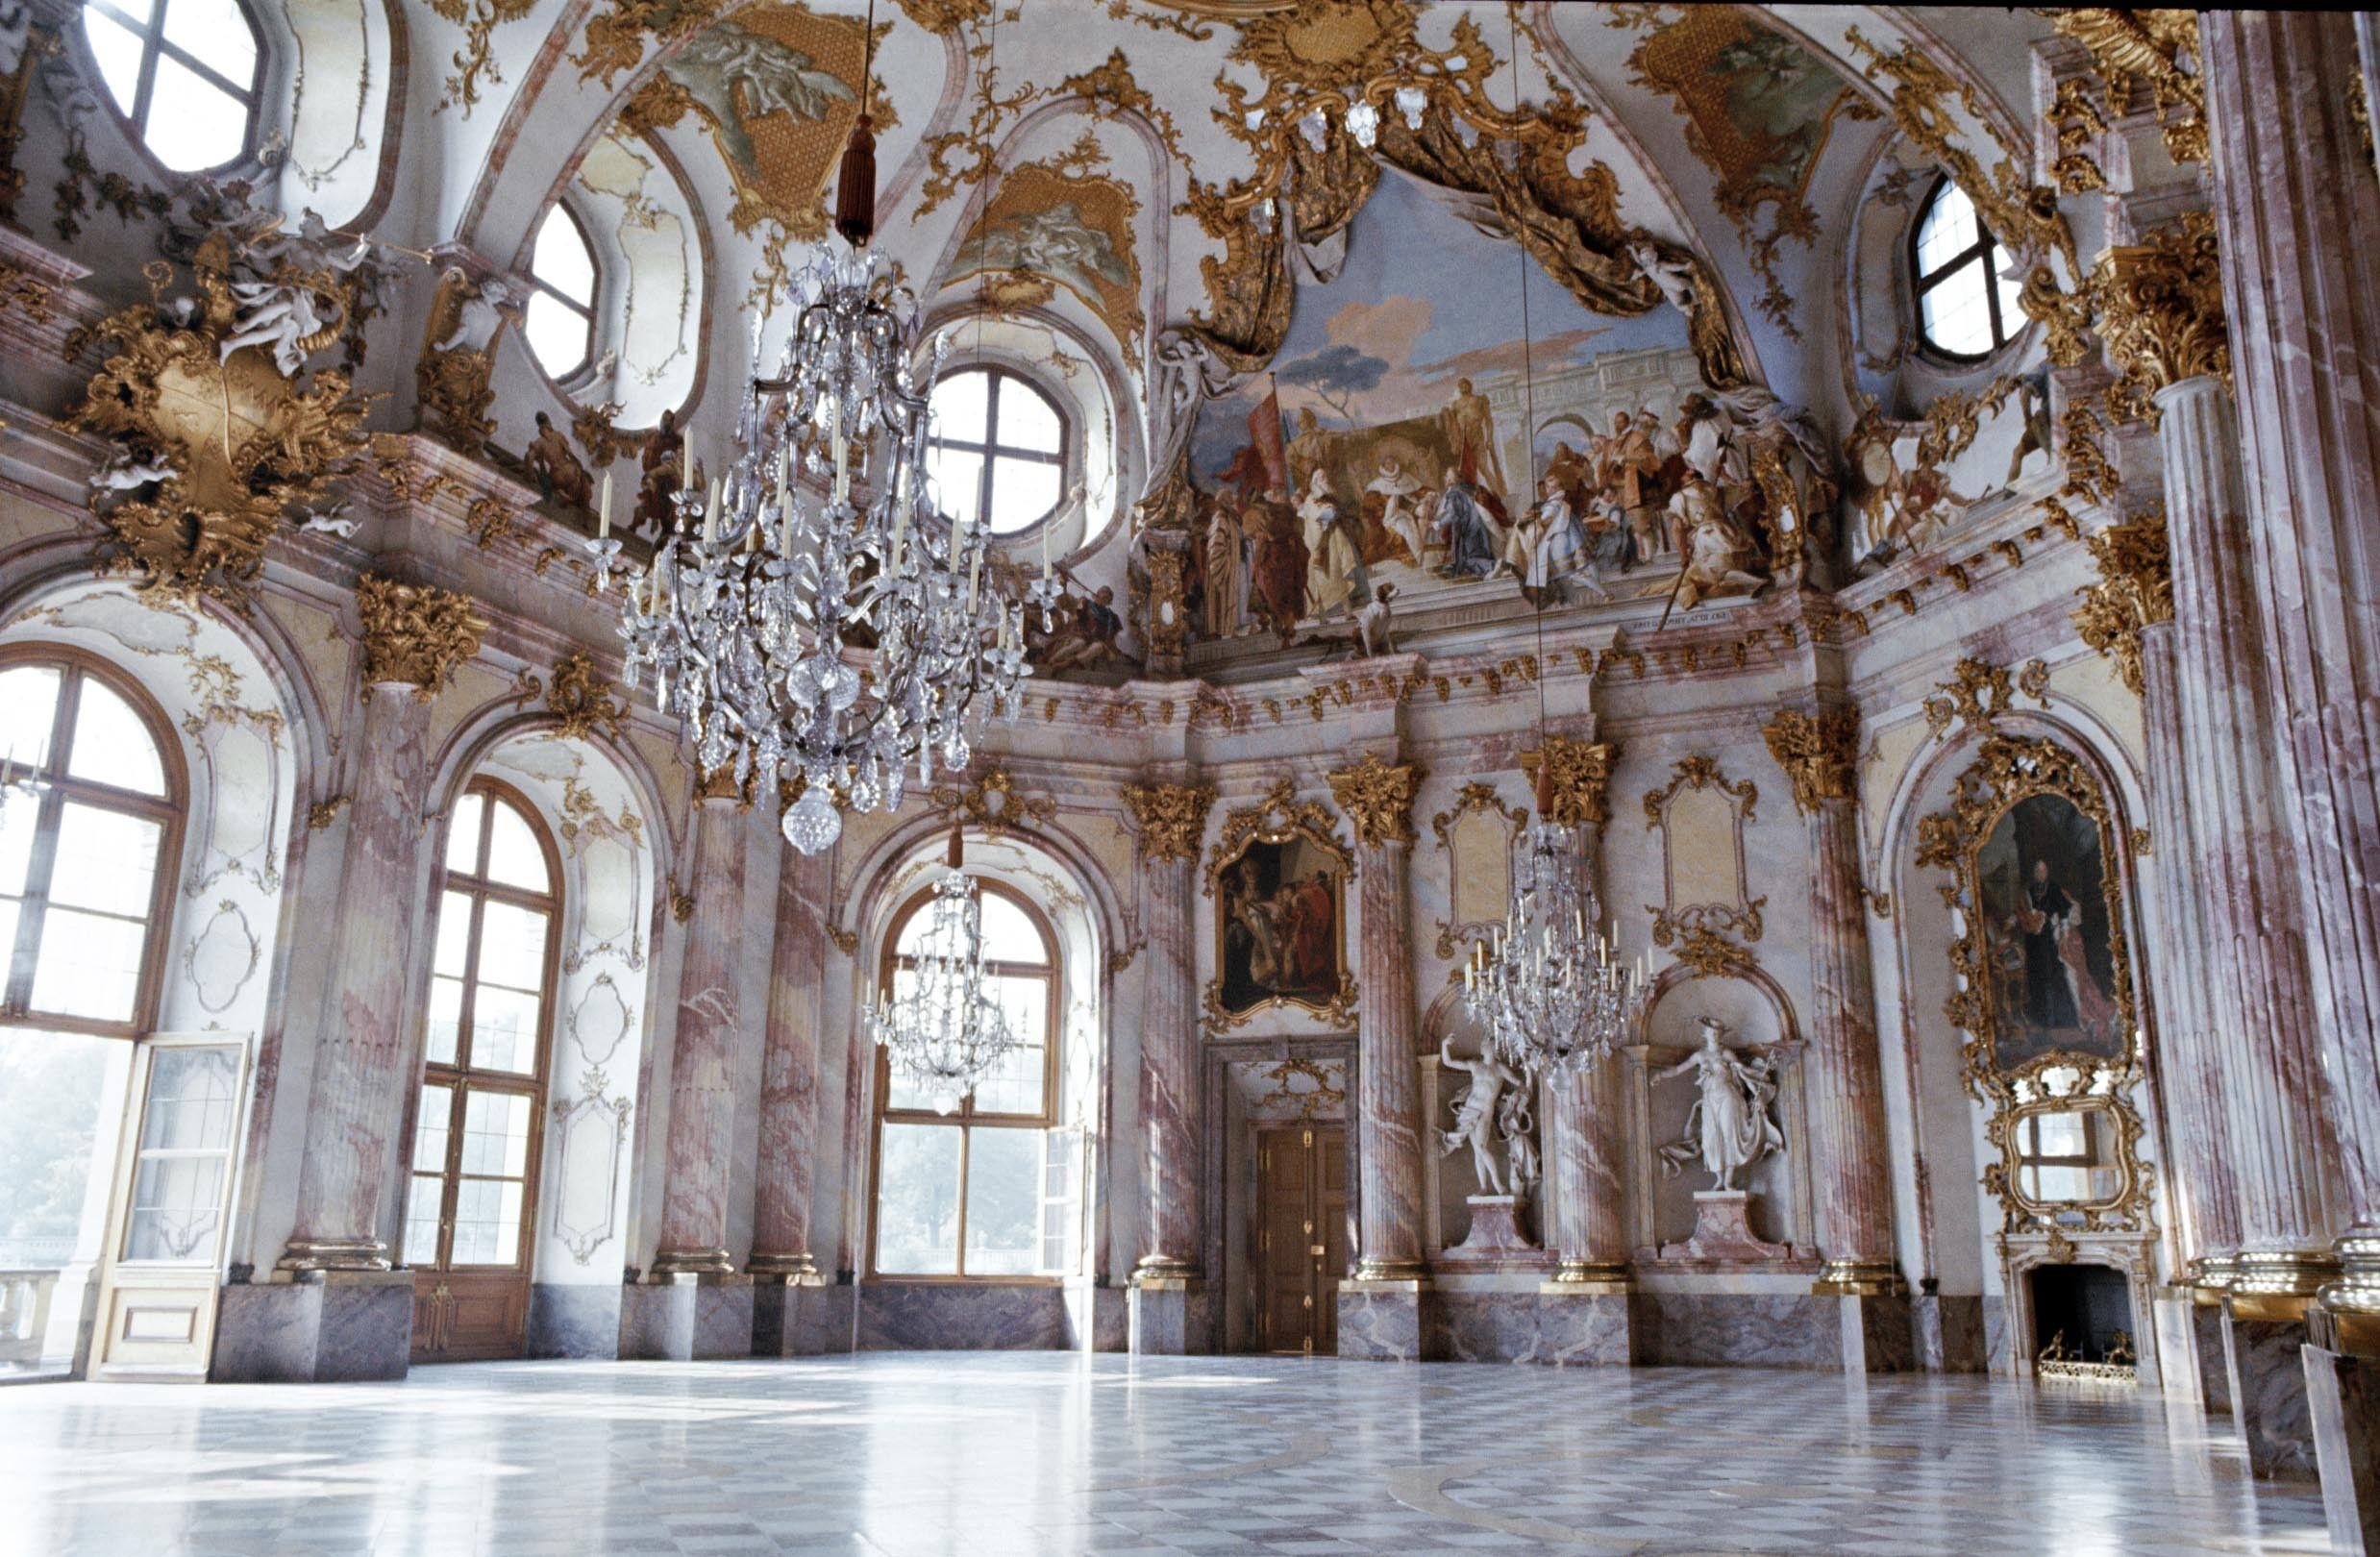 baroque architecture artsy pinterest baroque architecture architecture and castles. Black Bedroom Furniture Sets. Home Design Ideas